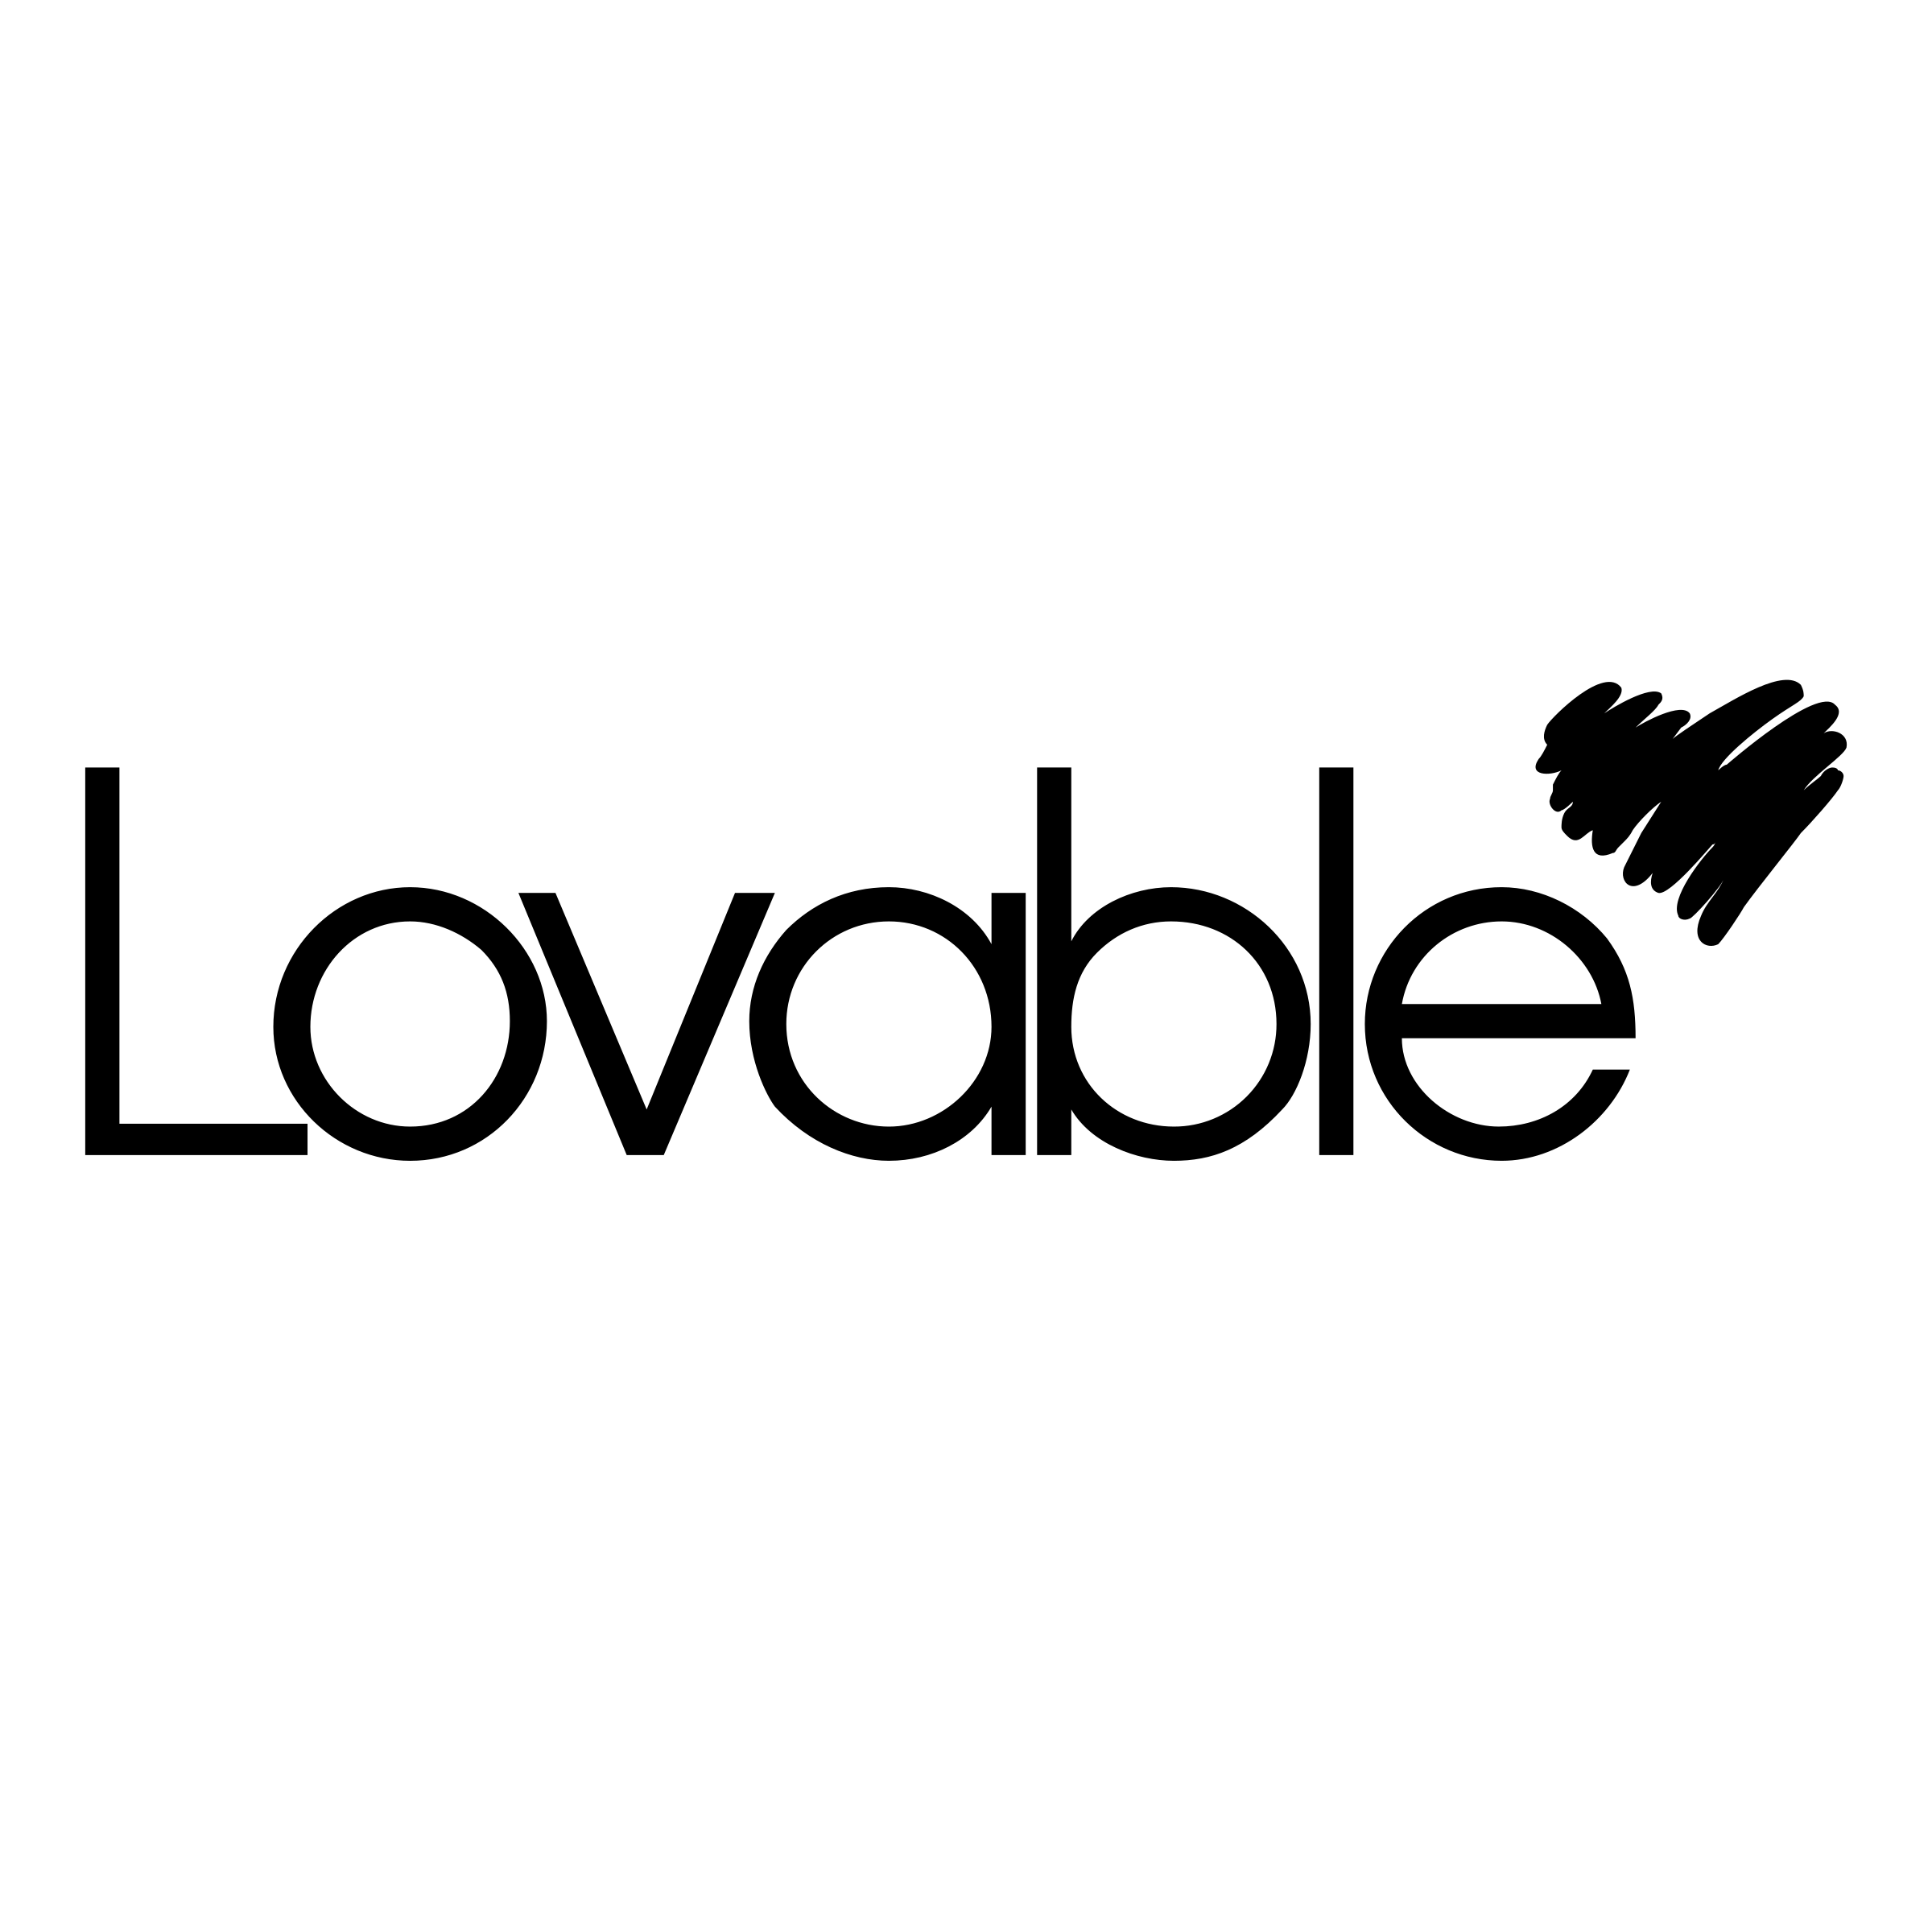 bf515875361d Lovable Logo PNG Transparent & SVG Vector - Freebie Supply